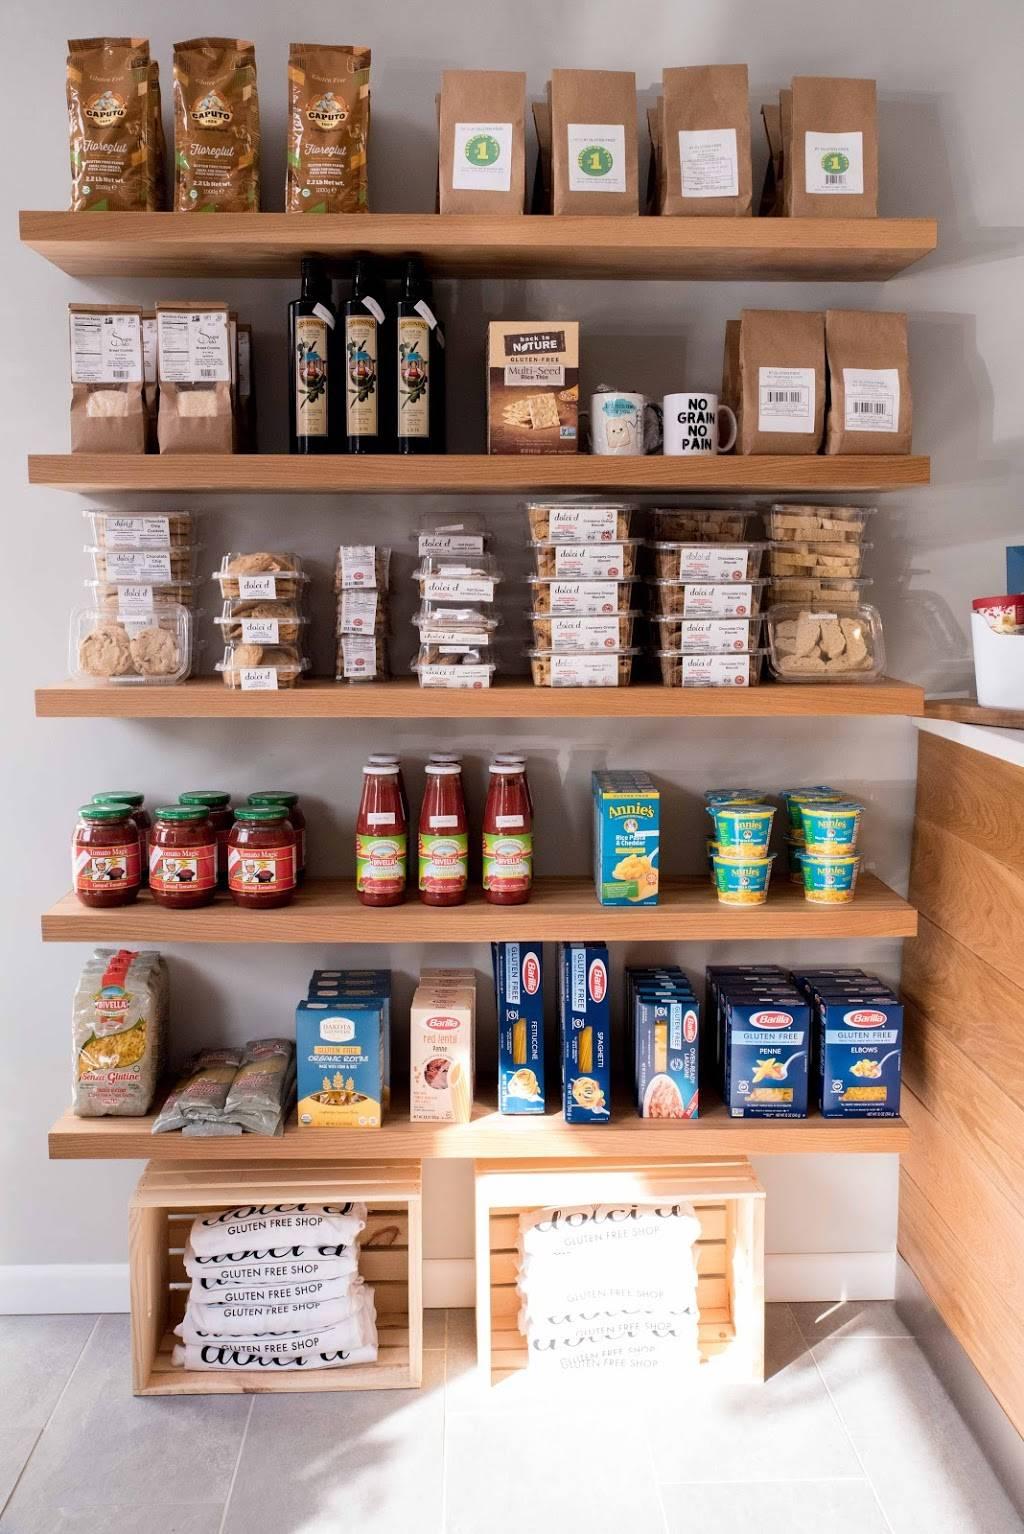 dolci d gluten free shop   bakery   919 Main St, Boonton, NJ 07005, USA   9734465607 OR +1 973-446-5607